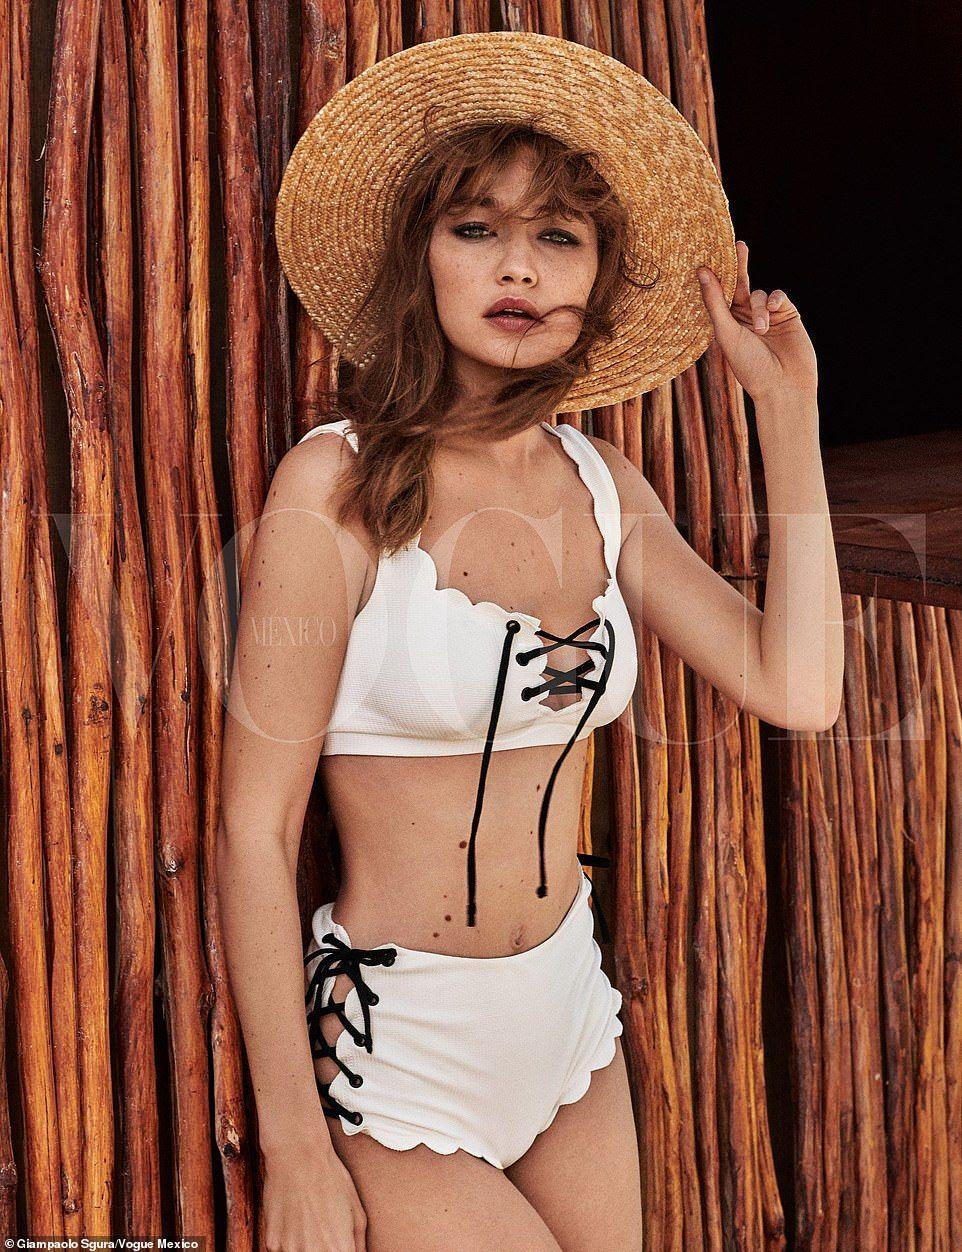 Gigi Hadid modèle un bikini blanc pour Mexico Vogue   – Swimsuit – Bikini – Mayo